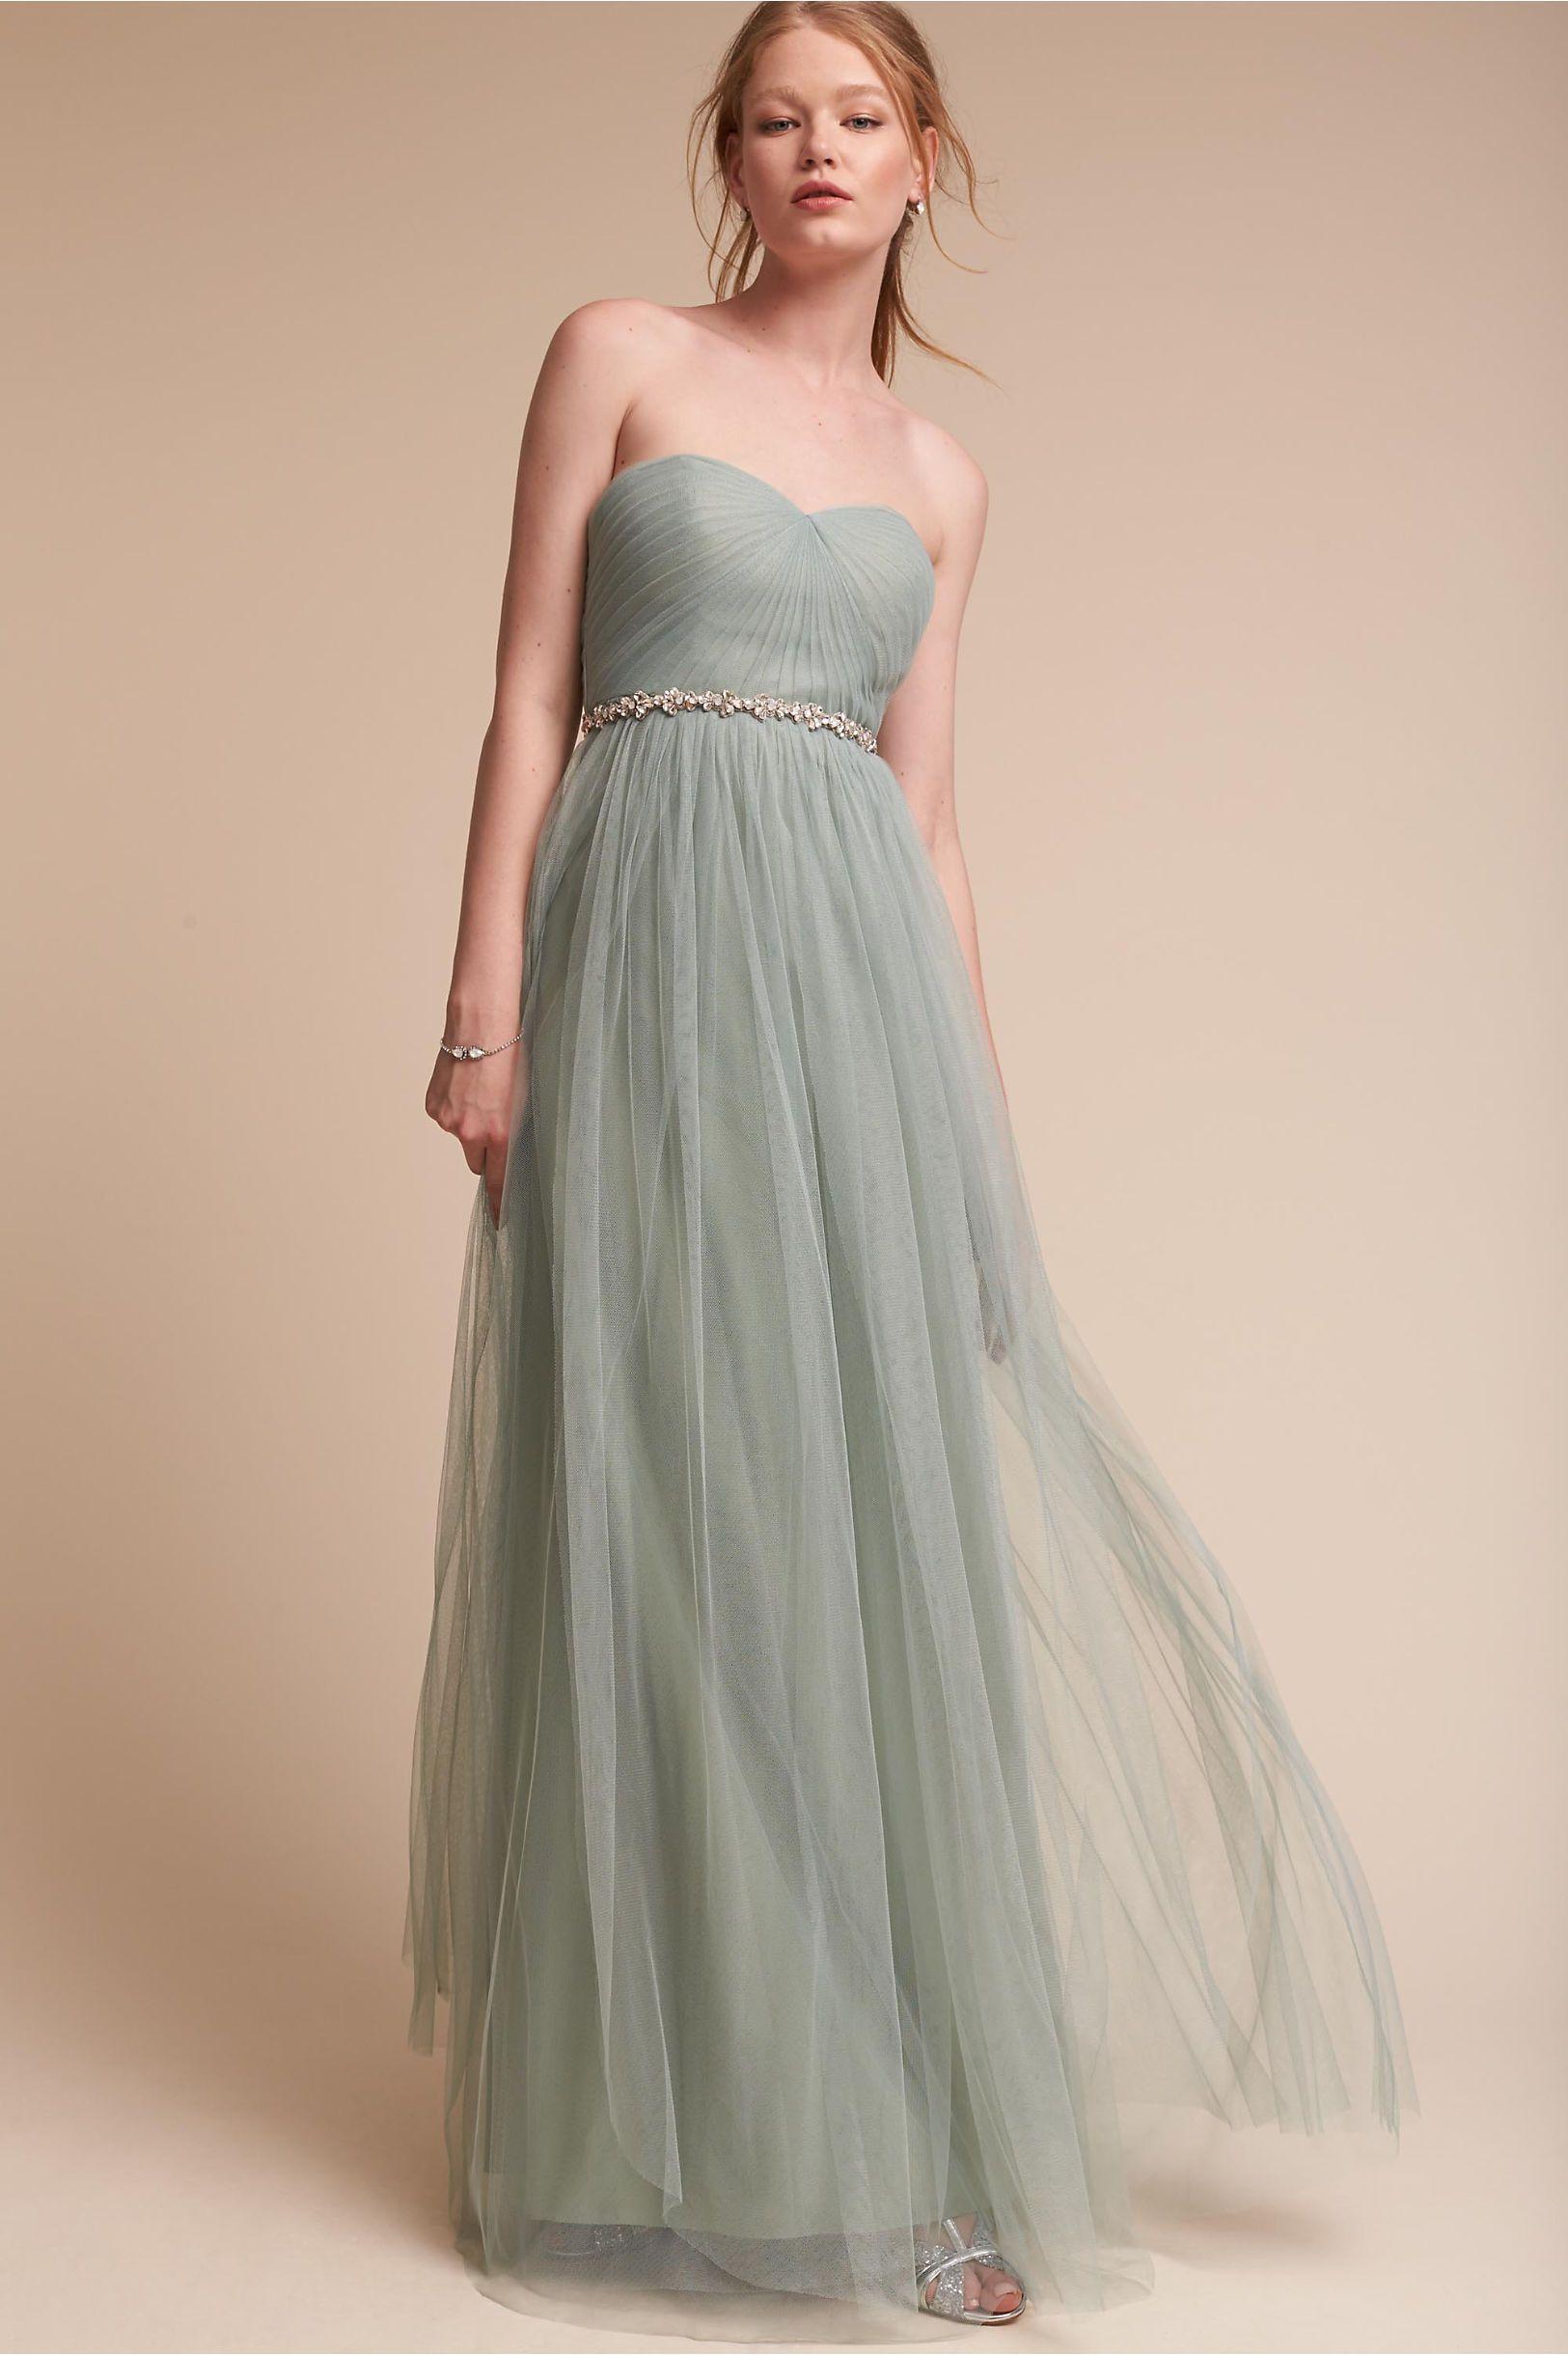 ca140197e61 BHLDN s Jenny Yoo Annabelle Dress in Seaglass